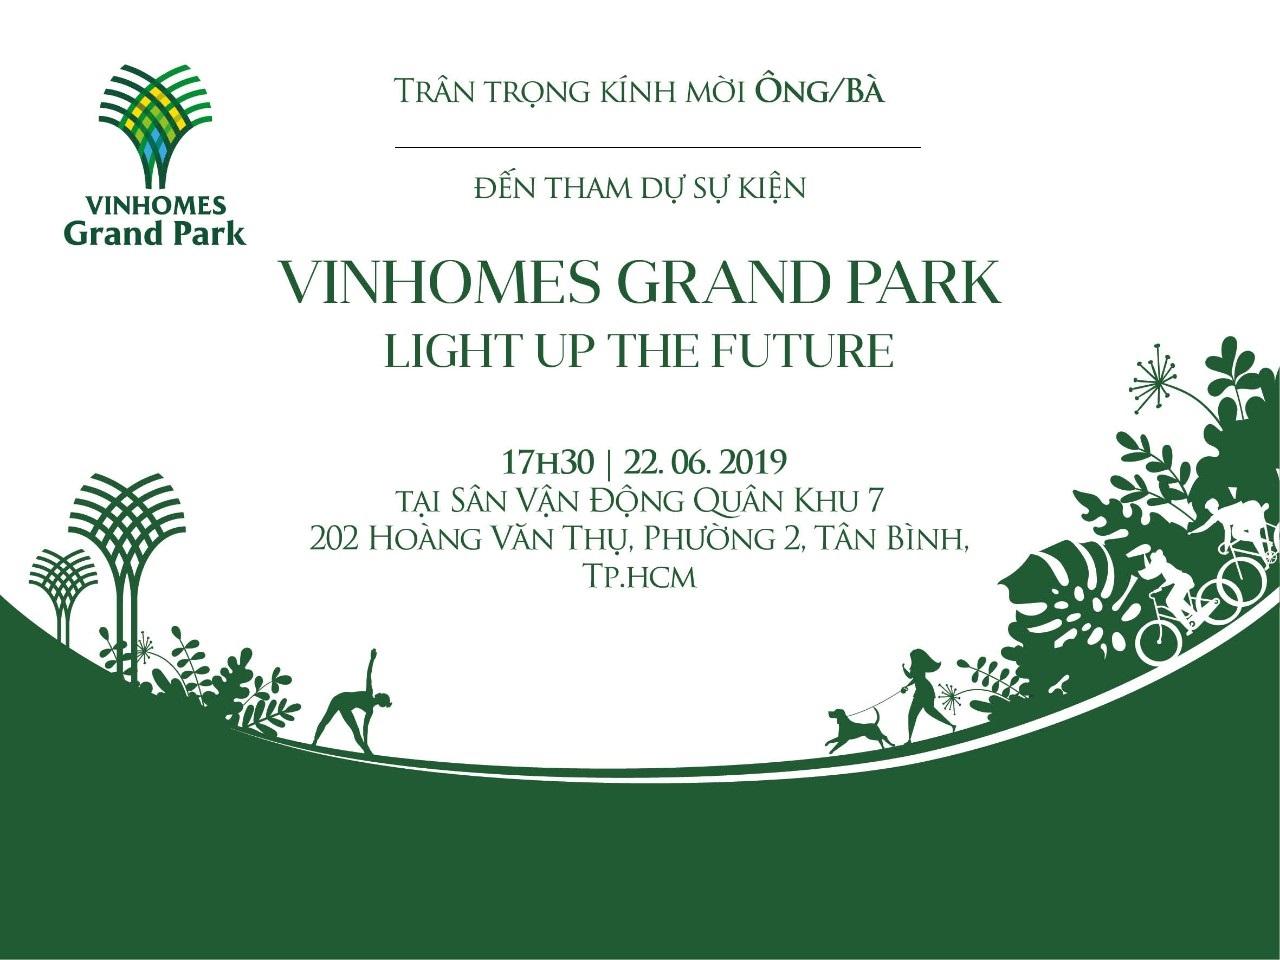 Vinhomes Grand Park - Light up the future